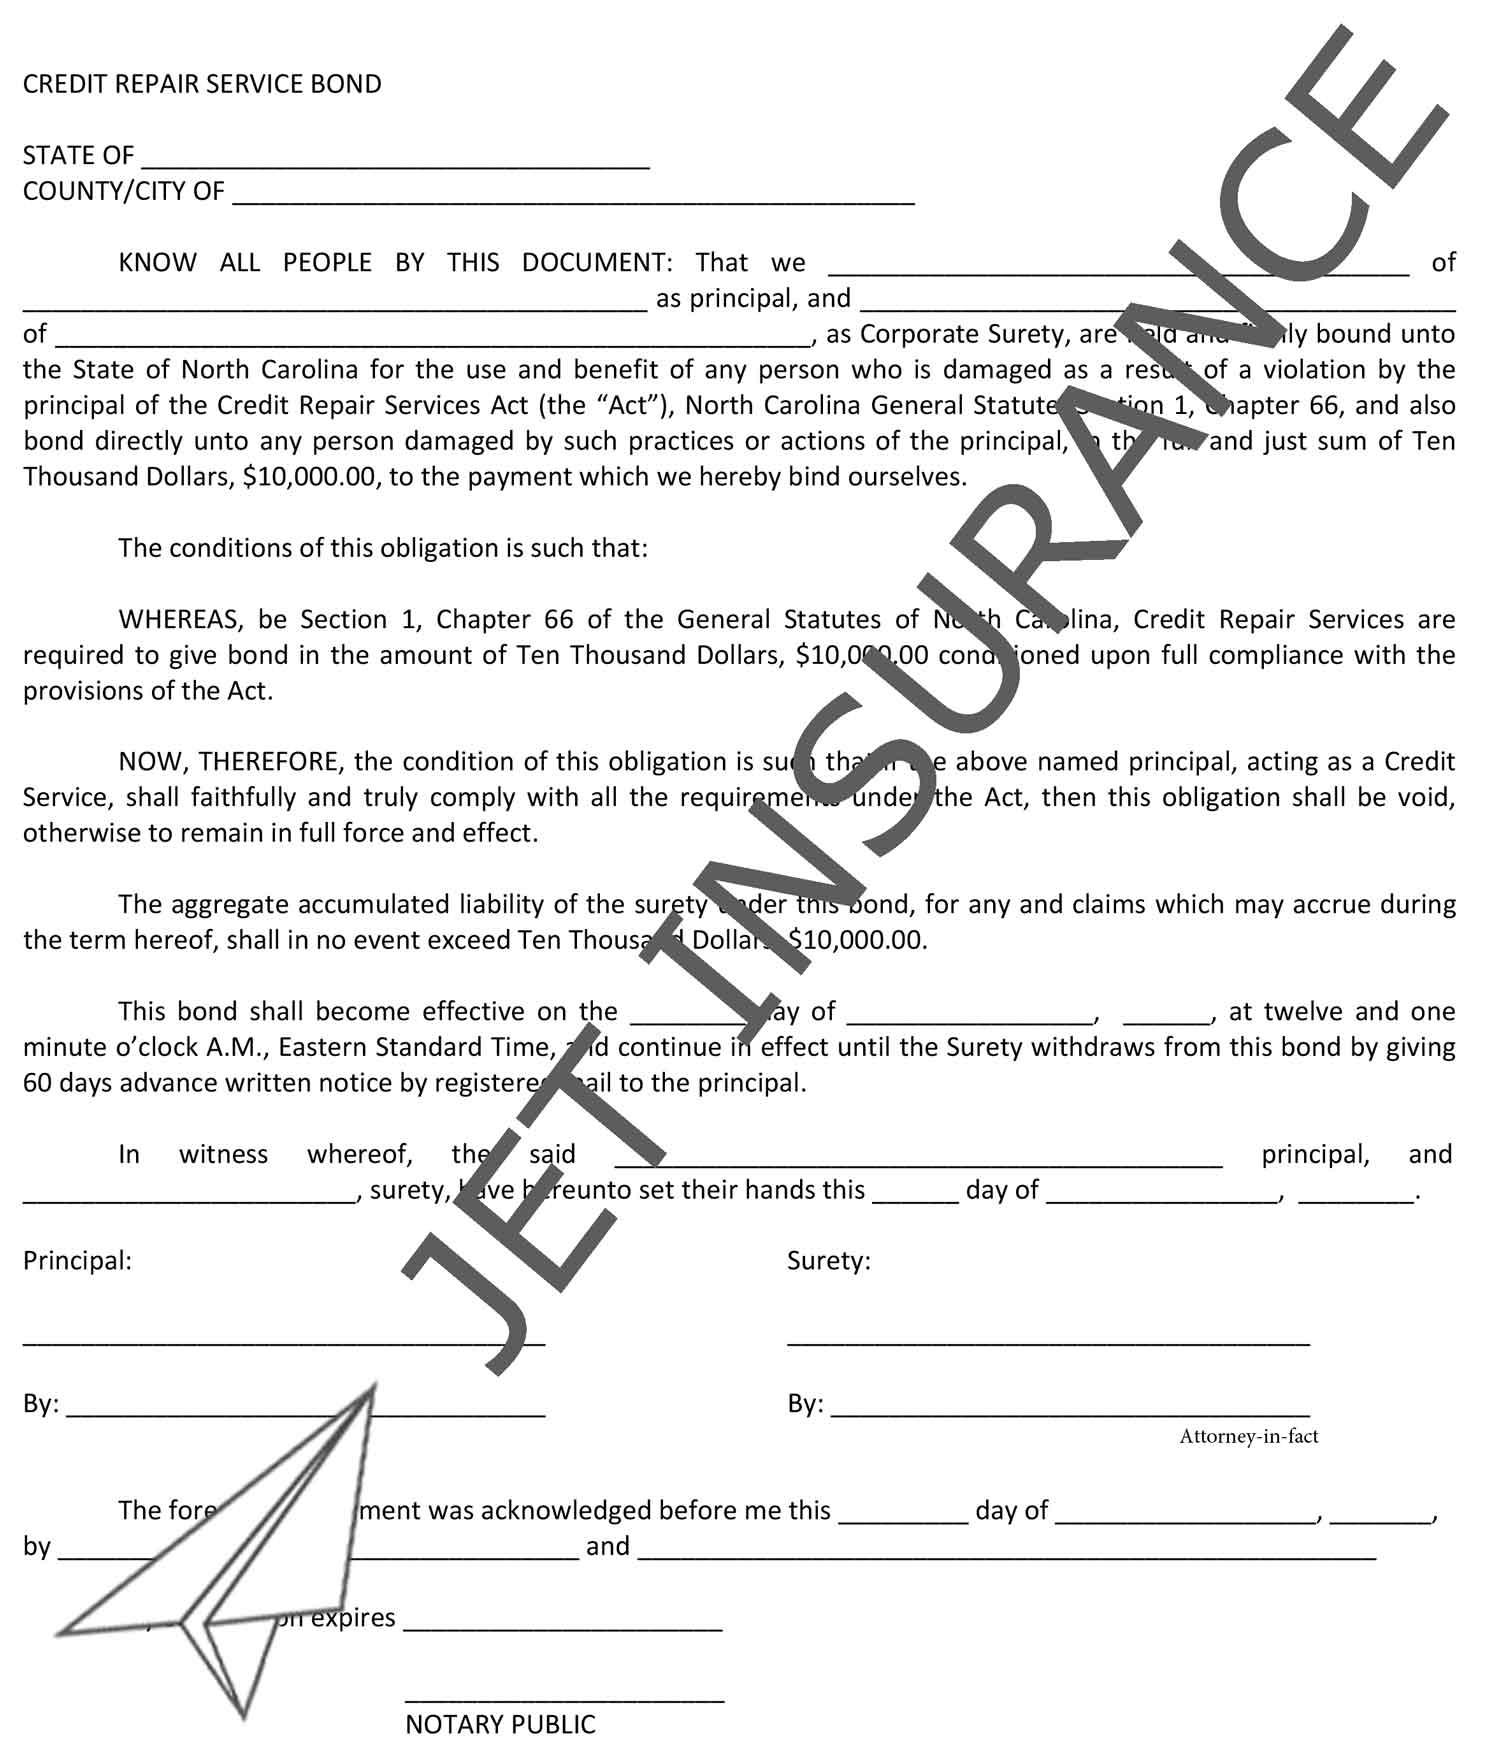 North Carolina Credit Repair Service Bond Form